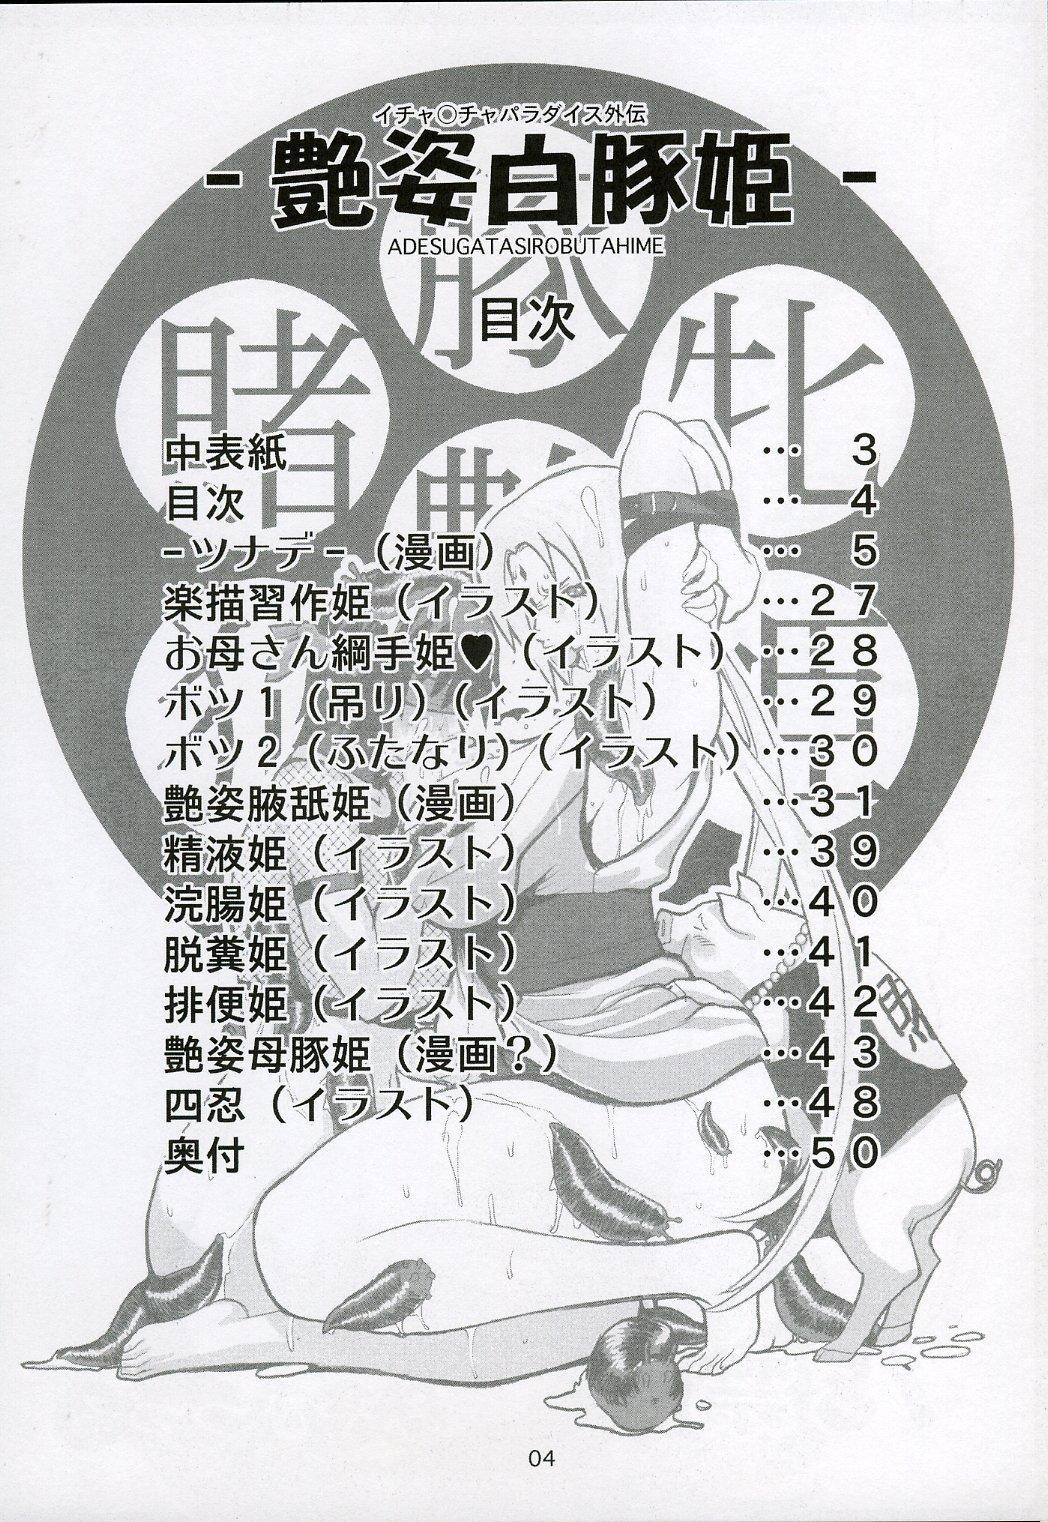 Adesugata Shiro Buta Hime   The Alluring White Pig Princess 2